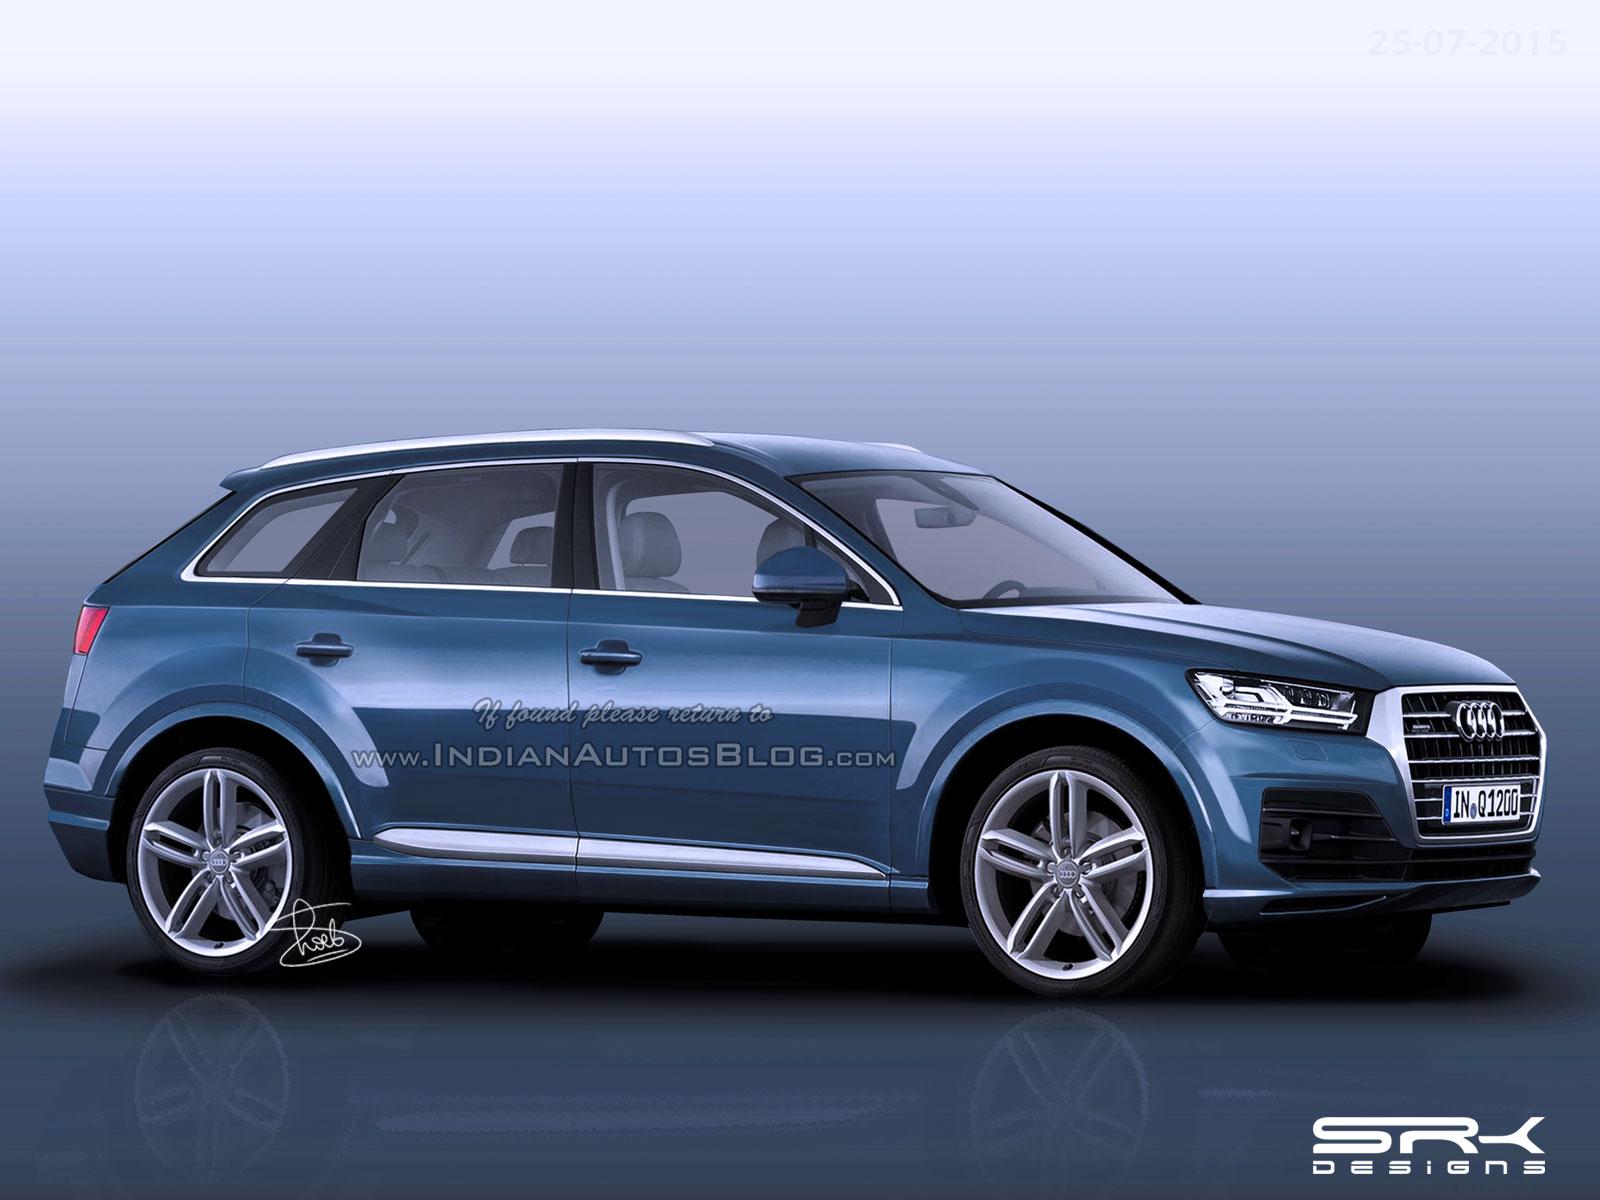 Audi Q1 compact SUV - IAB Rendering